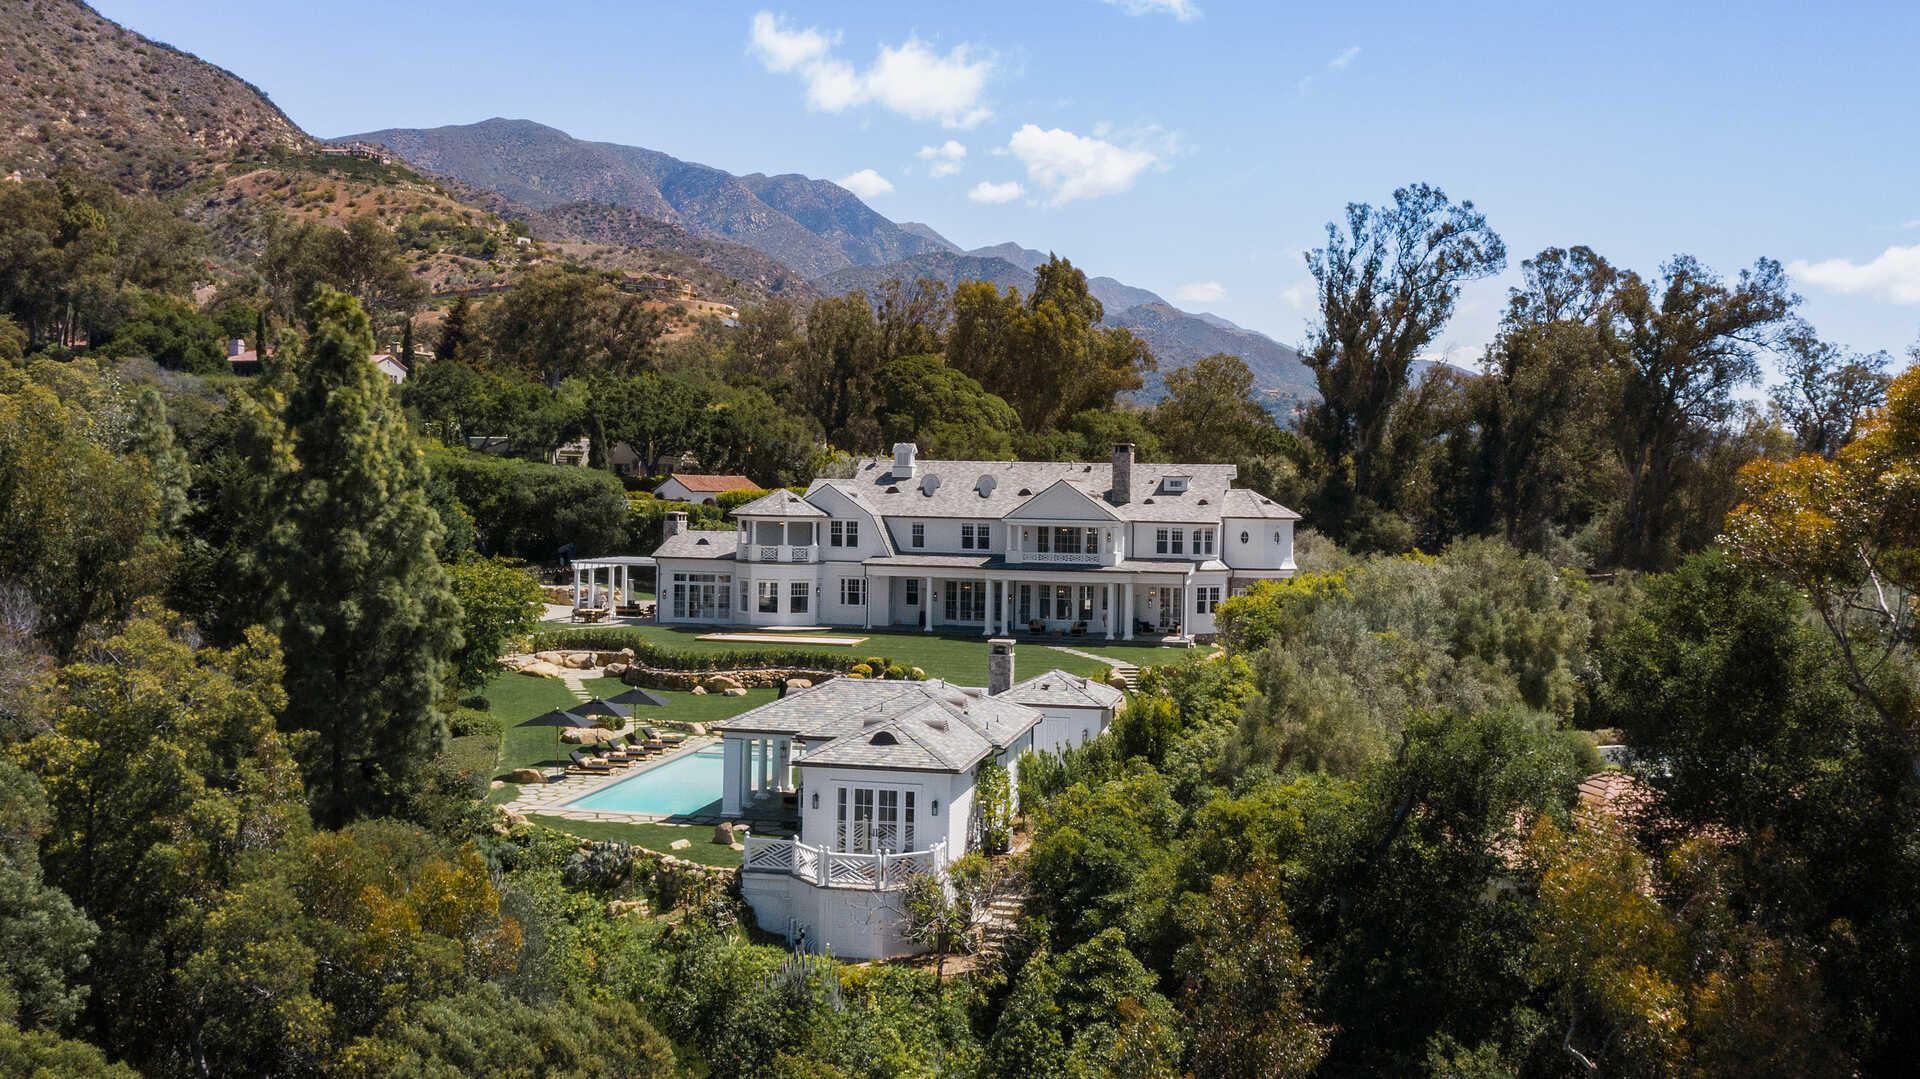 851 Buena Vista Dr, Montecito, CA 93108 - MLS#: 21-1669